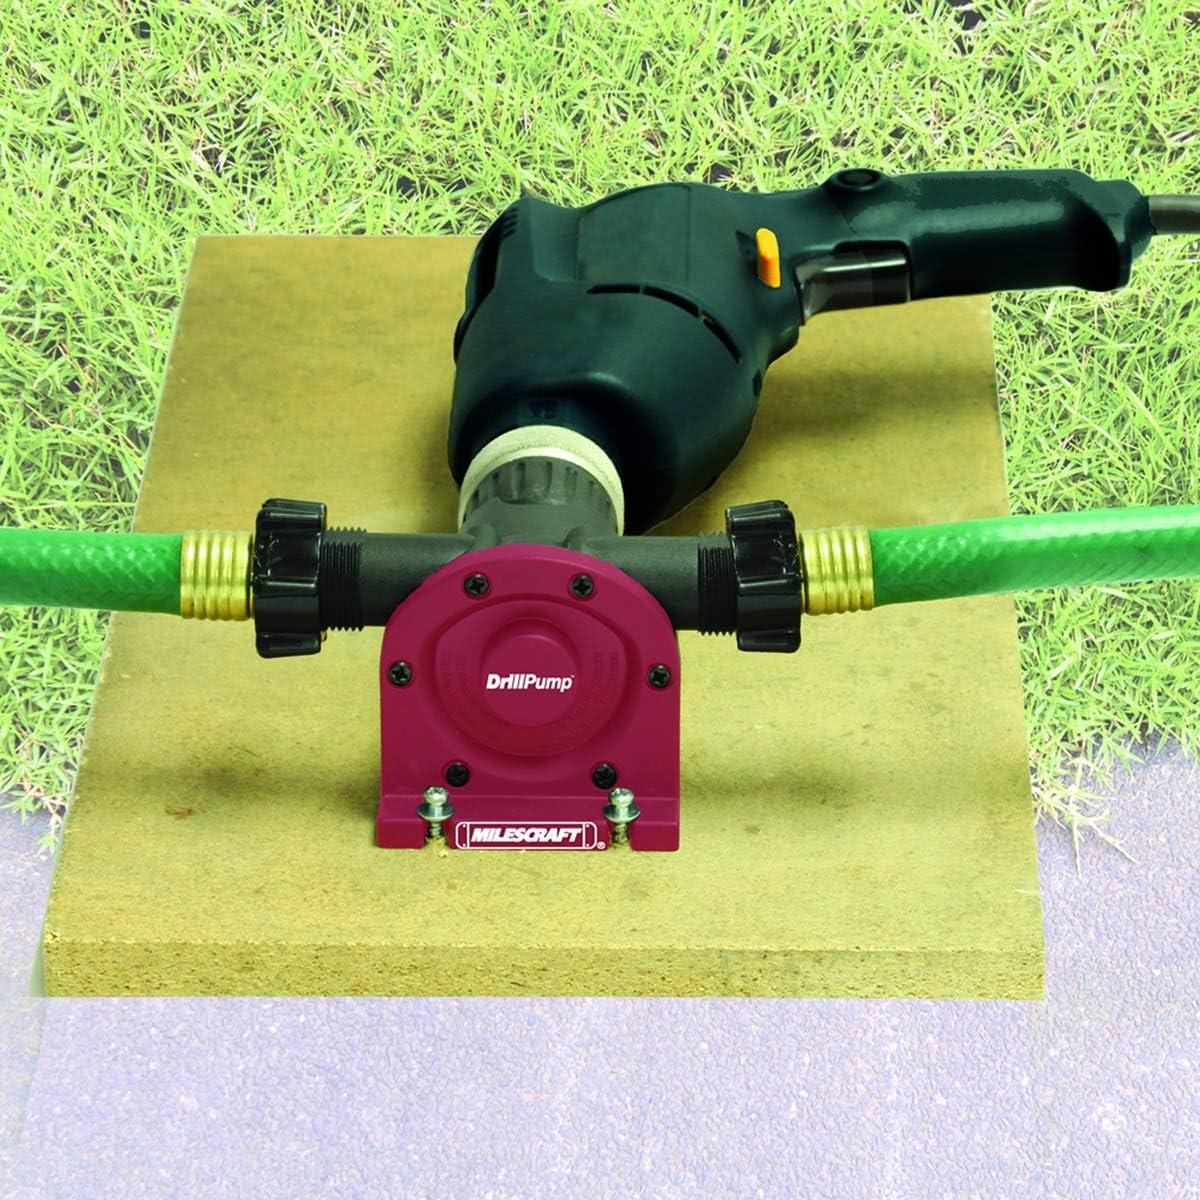 Milescraft 1314 DrillPump750 - Self Priming Water Transfer Pump: Home Improvement